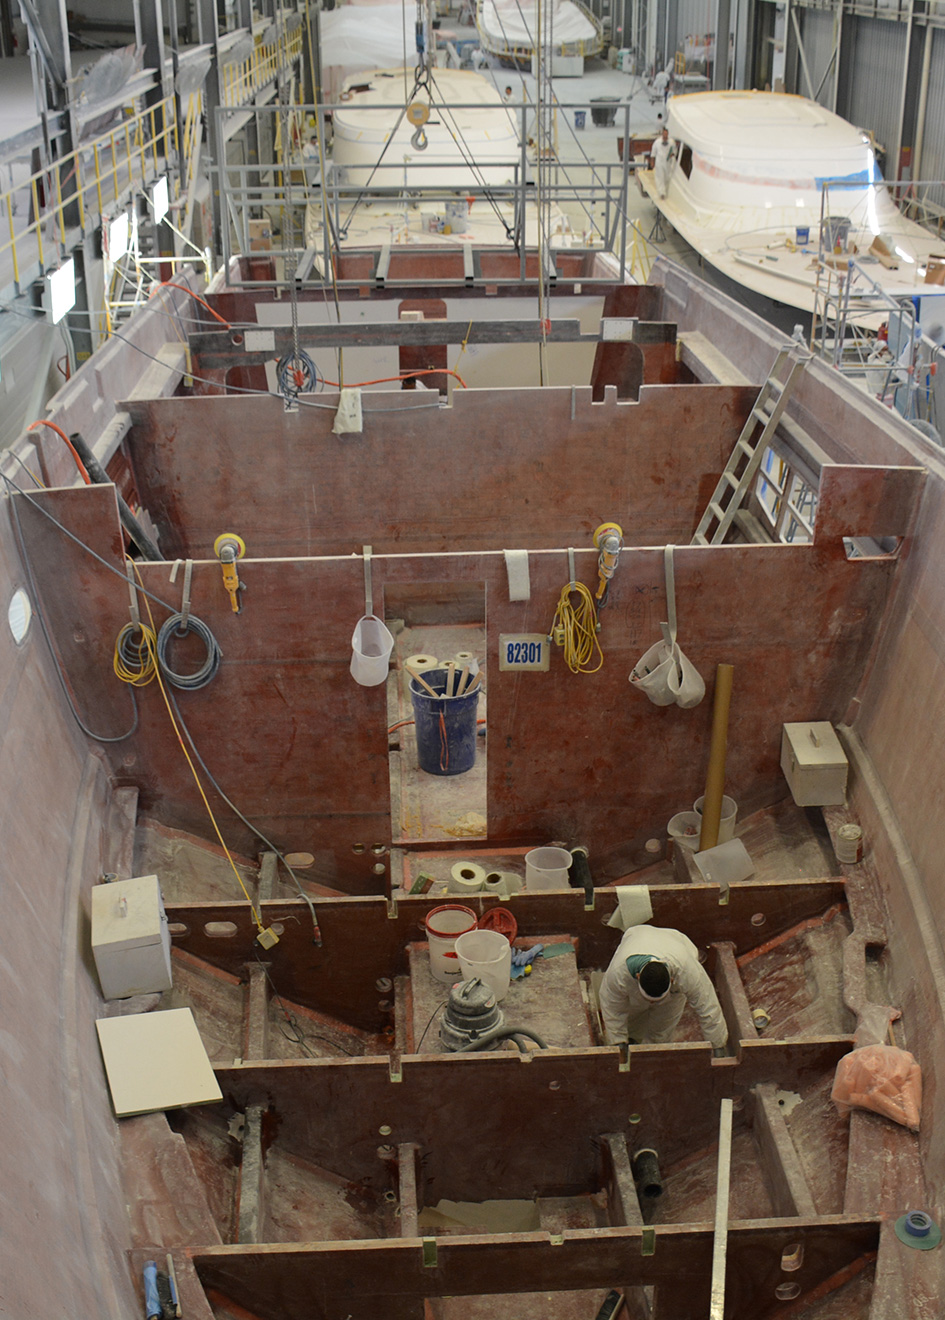 Viking 82 Motor Yacht behind the scenes